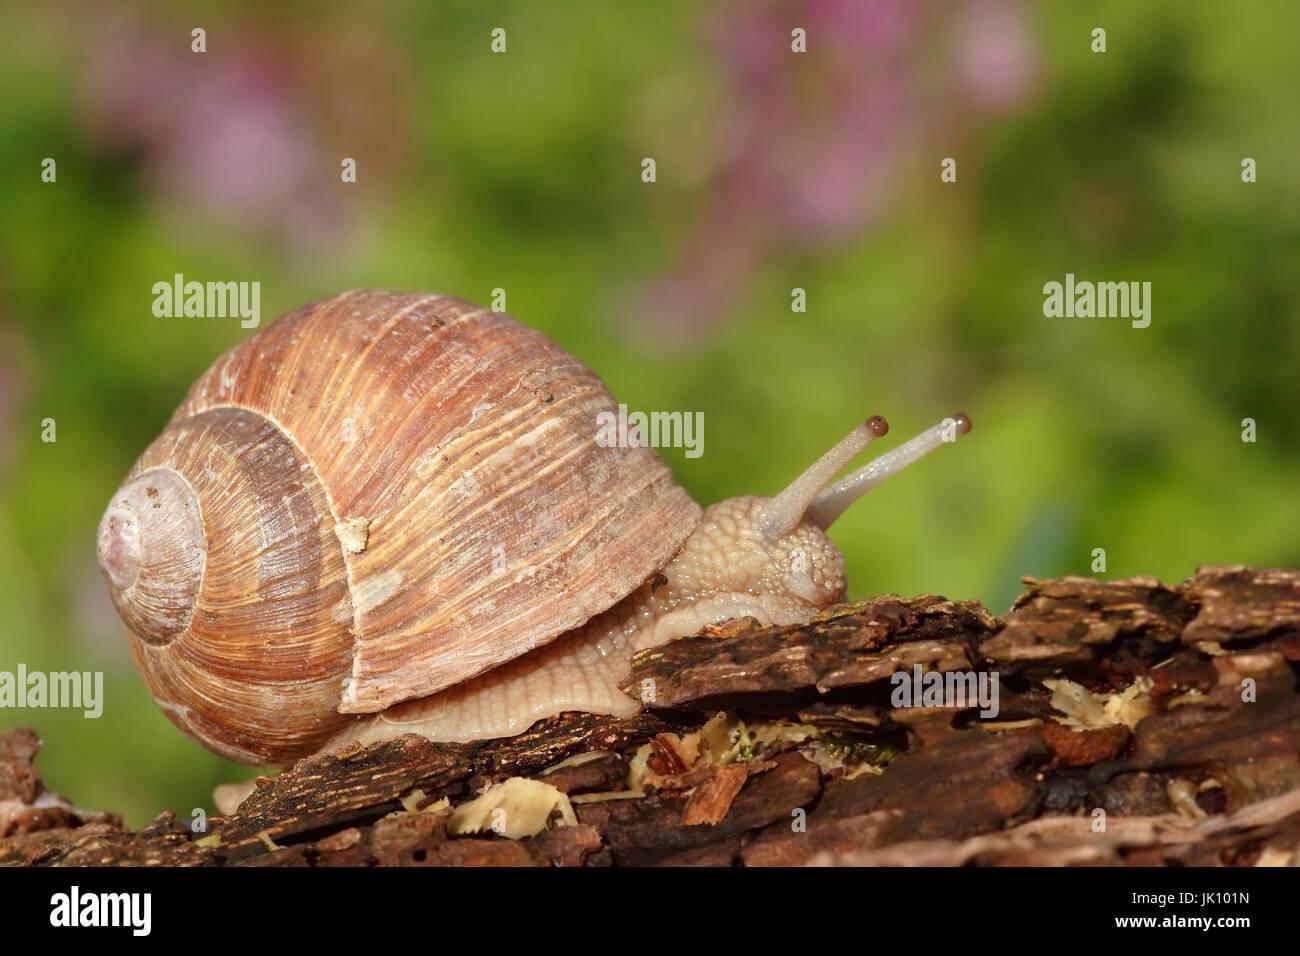 Edible snail on the Lower Rhine, Weinbergschnecke am Niederrhein - Stock Image